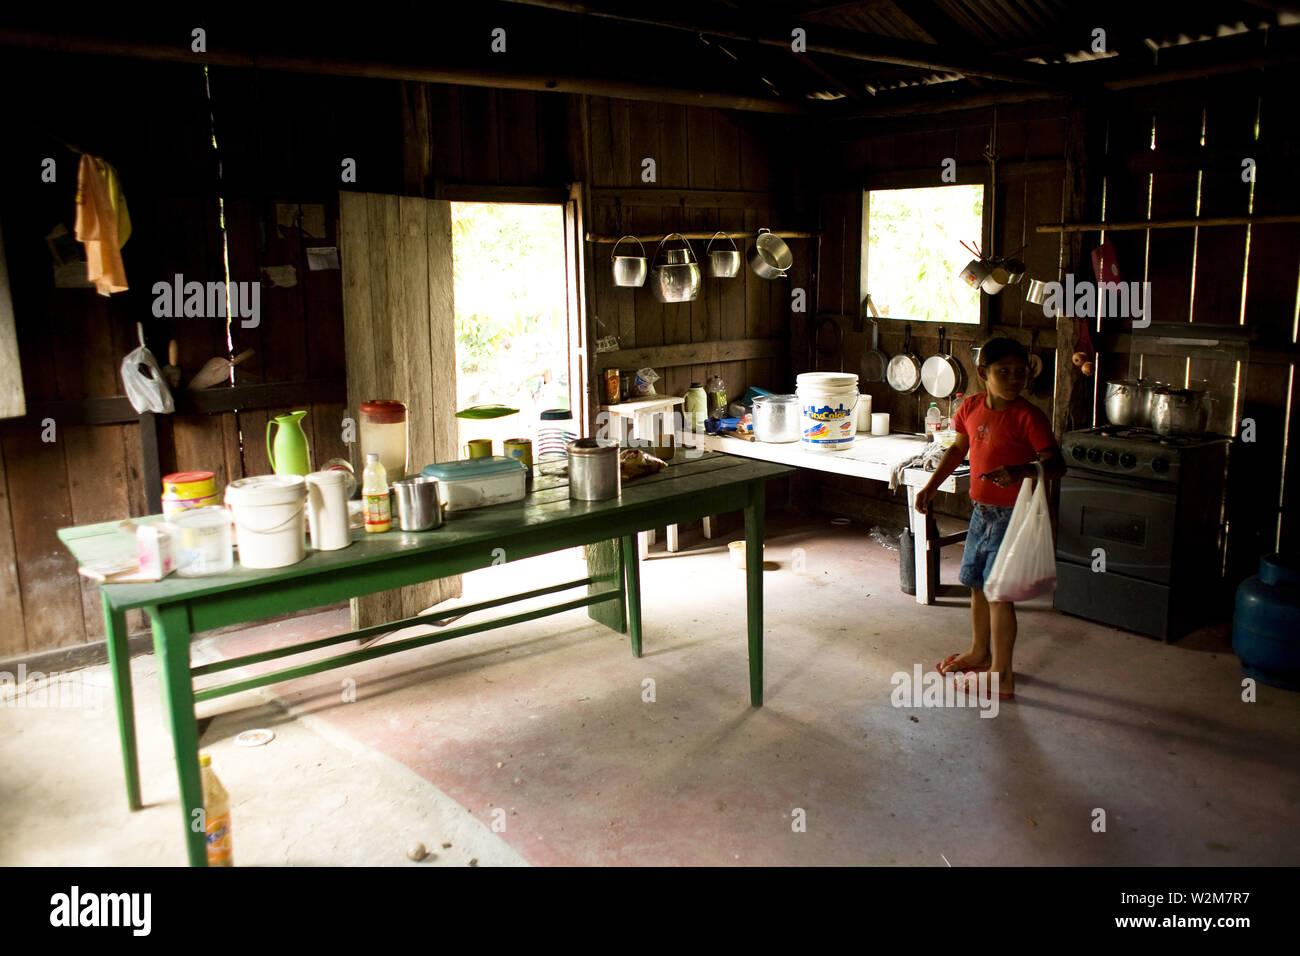 House, Kitchen, Barreirinha Community, Macaco River, Manaus, Amazônia, Amazonas, Brazil Stock Photo